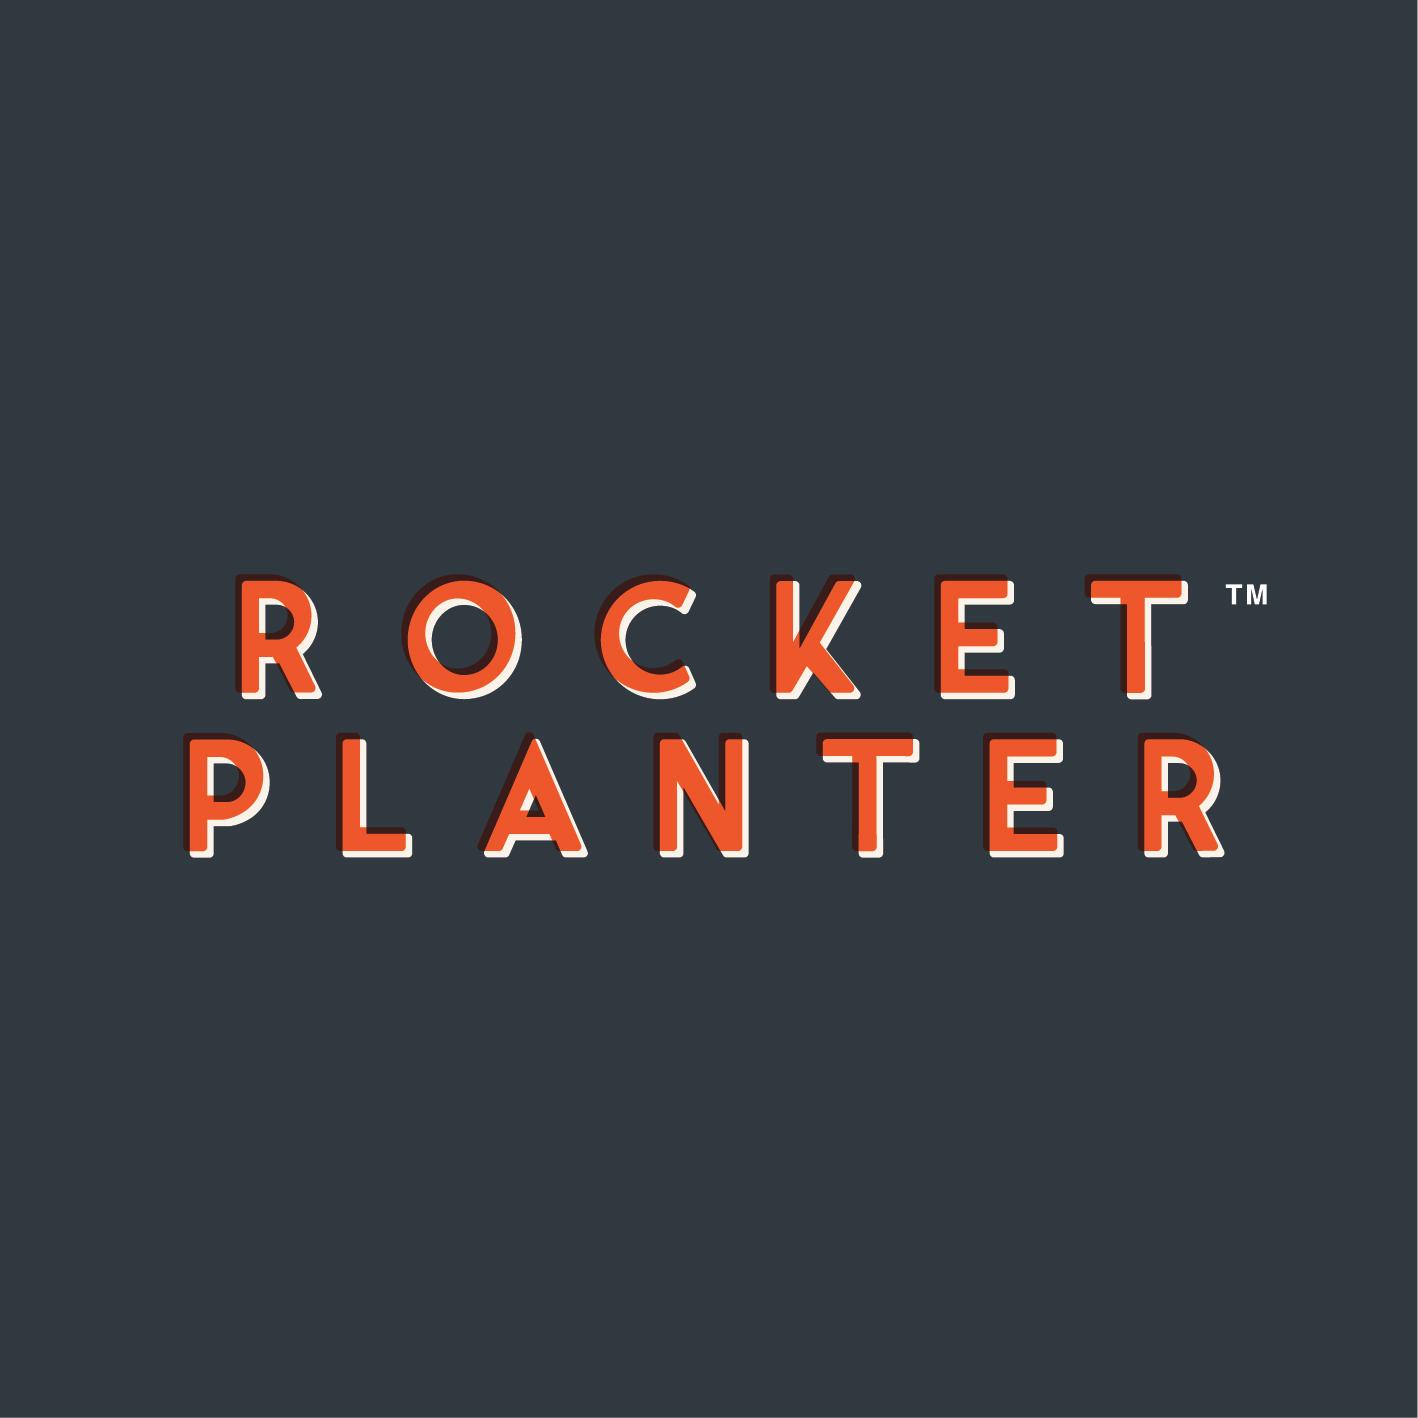 Rocket Planter Logo - Style 2.jpg